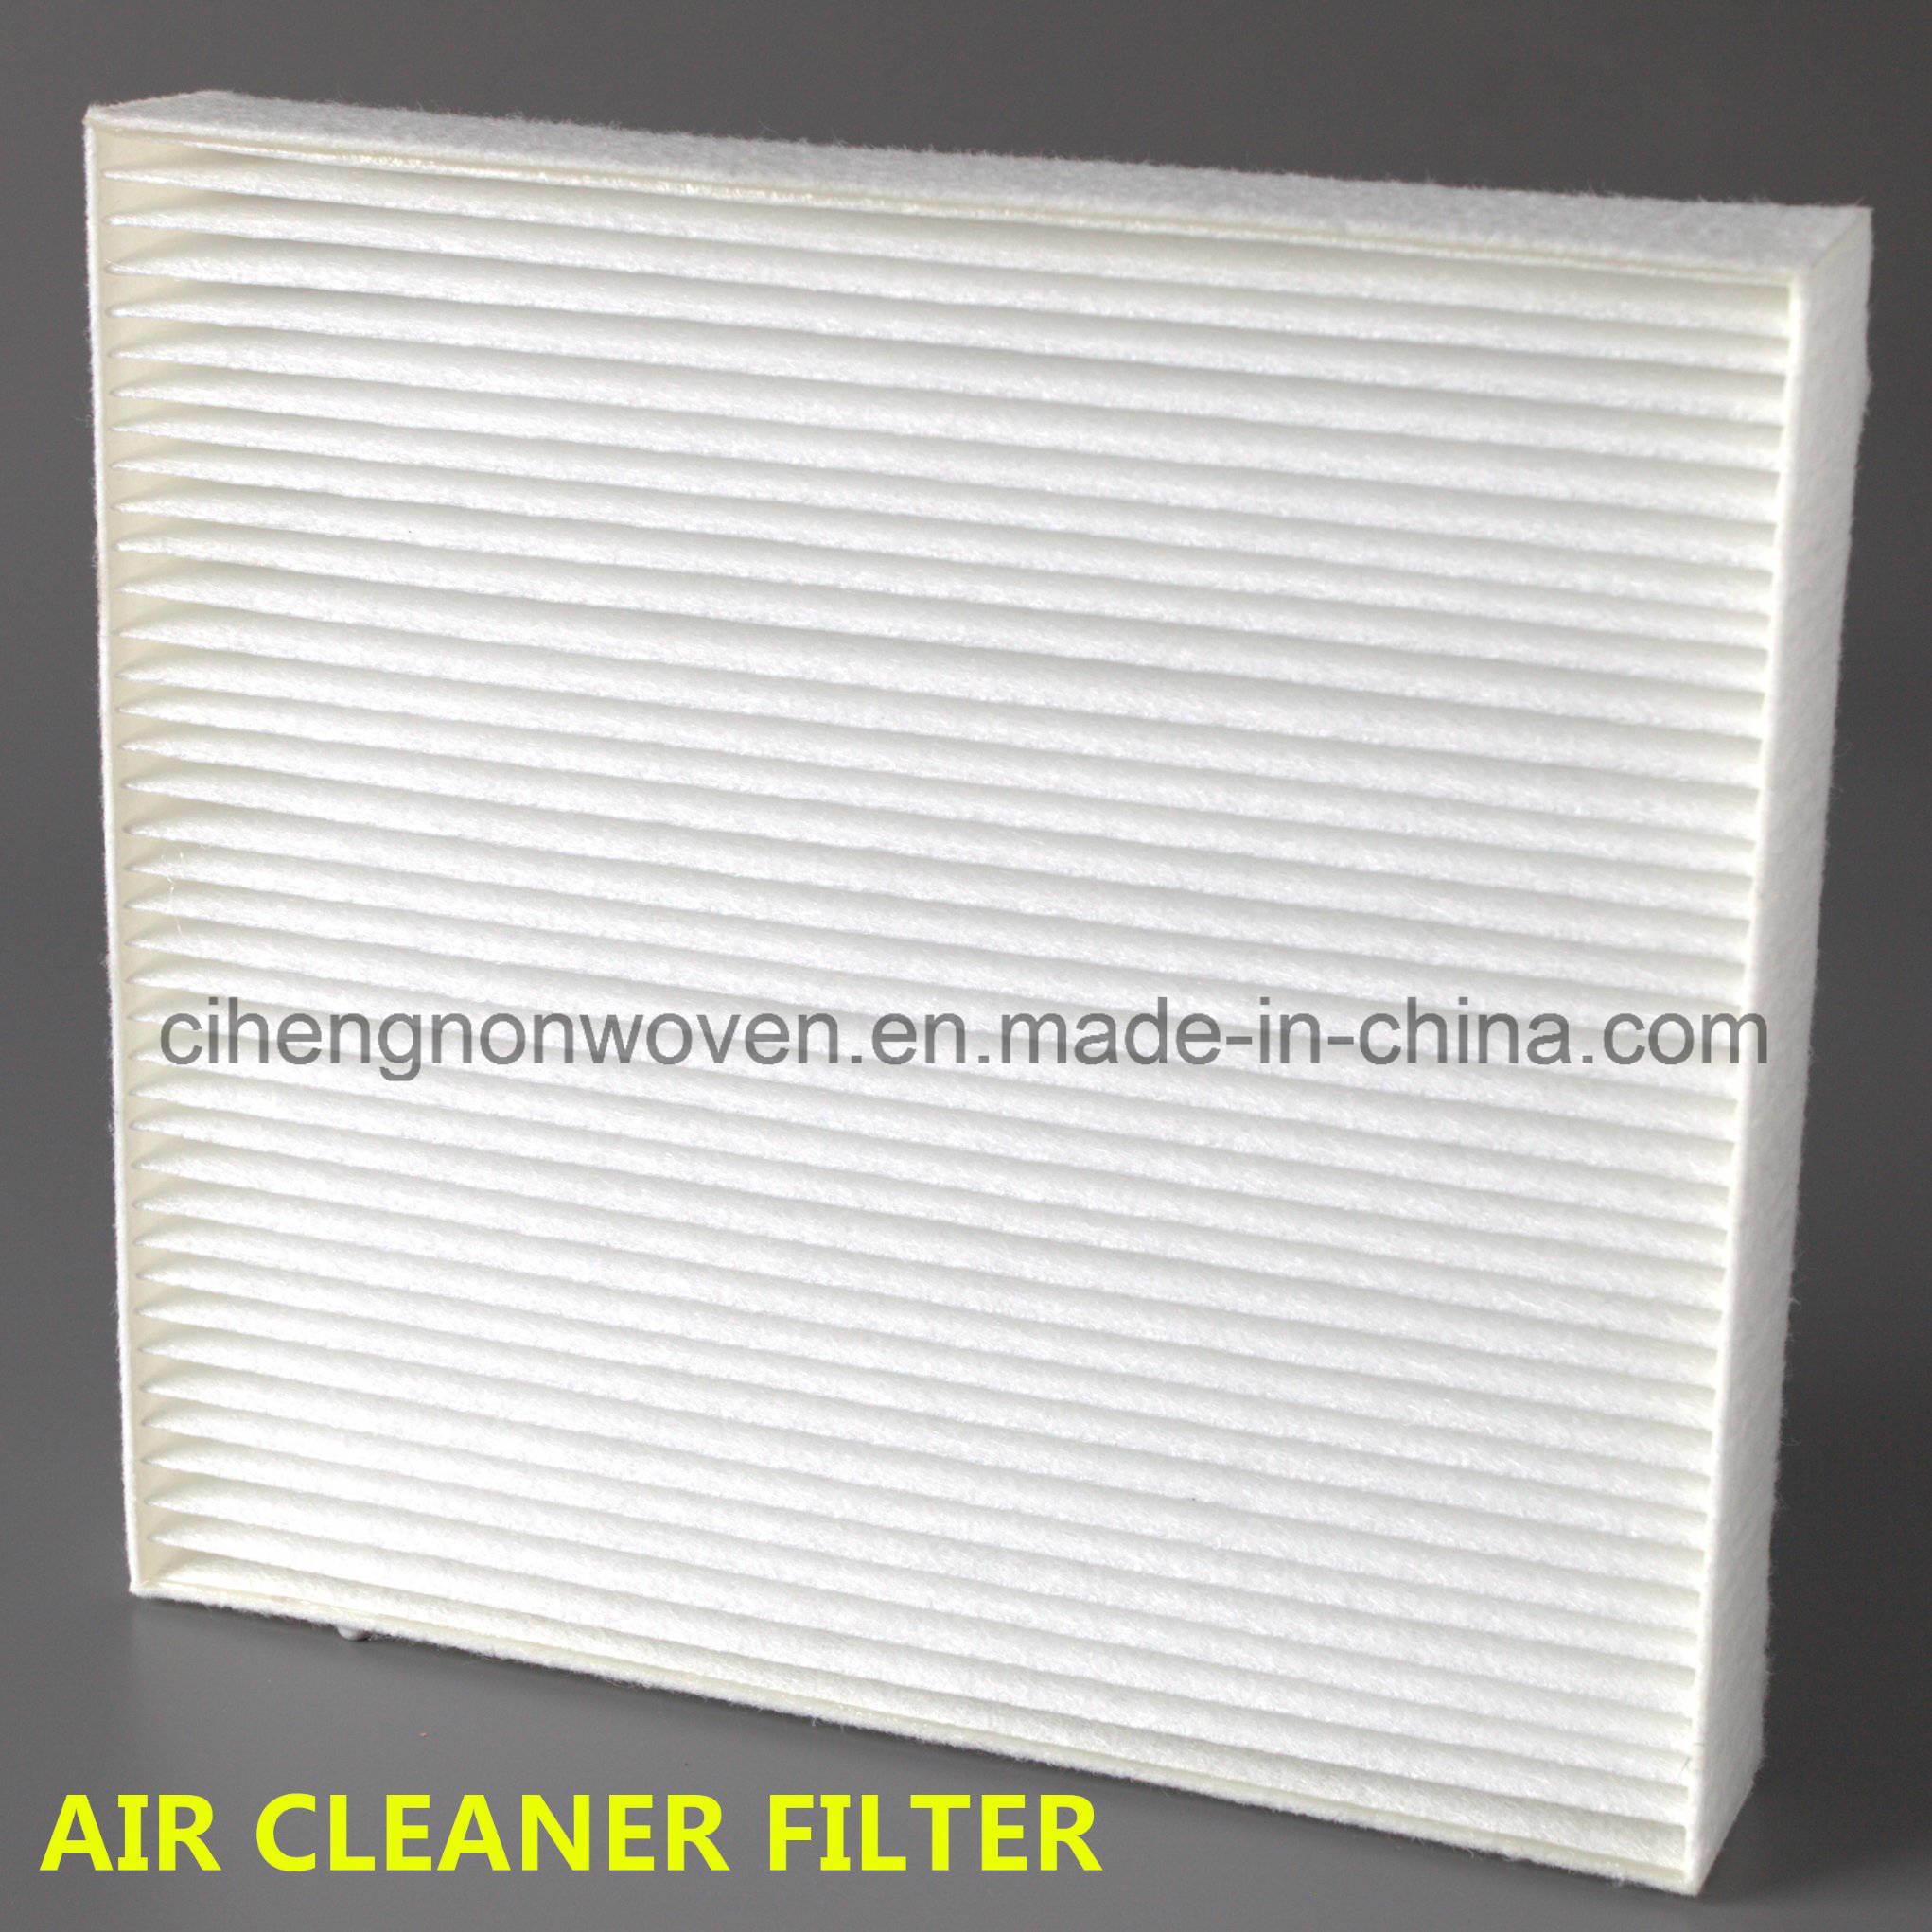 95% Filtration Efficiency Melt-Blown Composite Filter Media